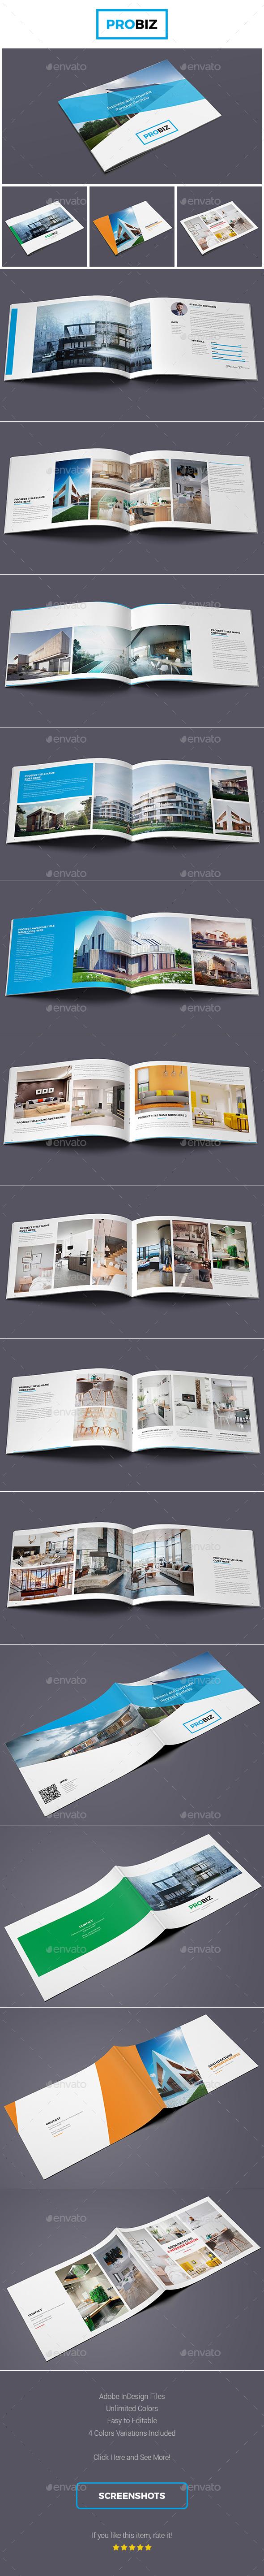 ProBiz – Business and Corporate Personal Portfolio - Portfolio Brochures